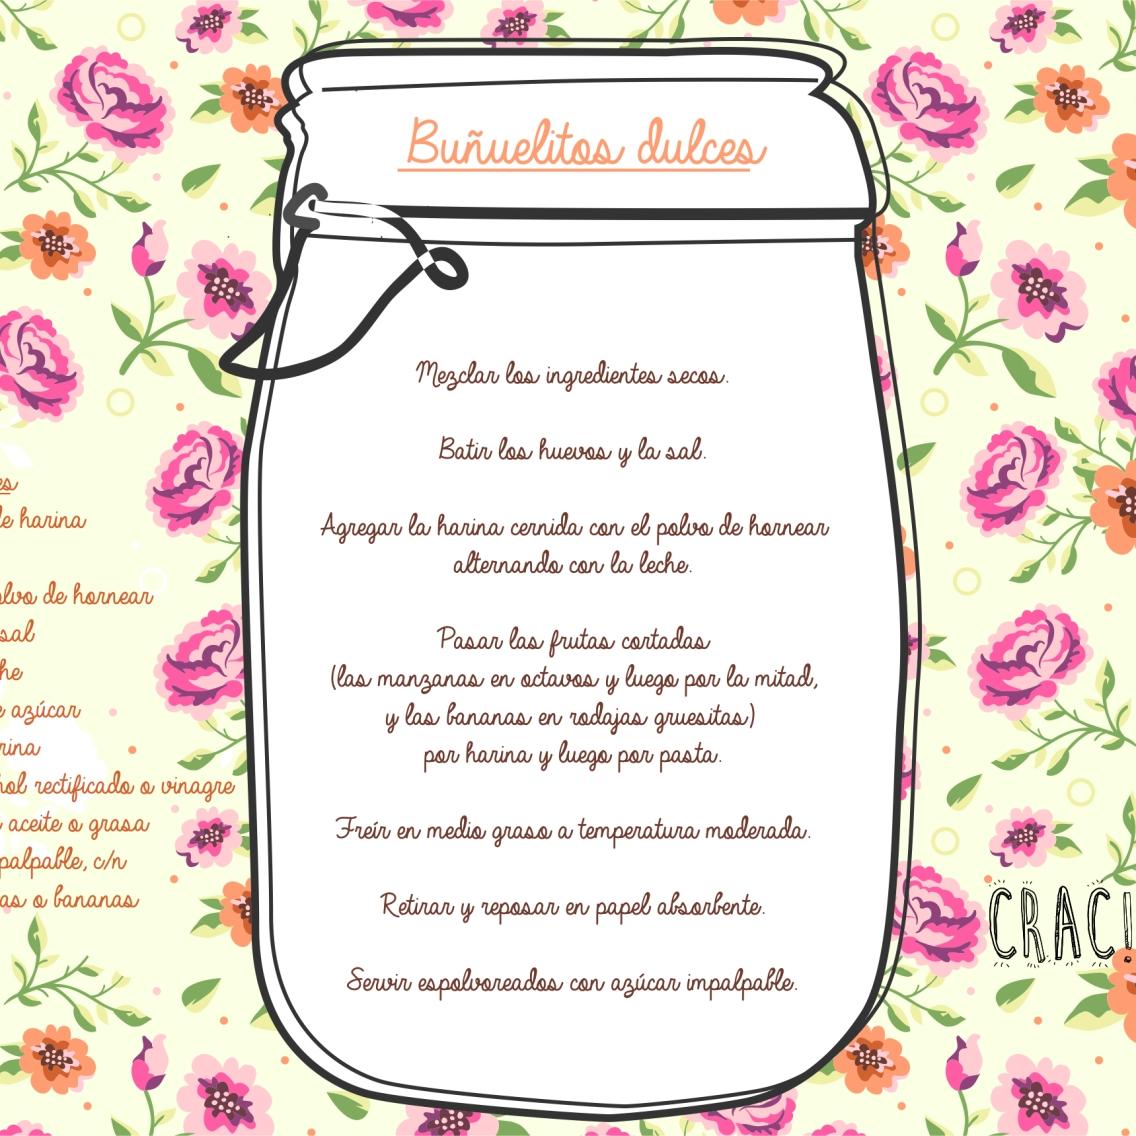 Buñuelitos dulces